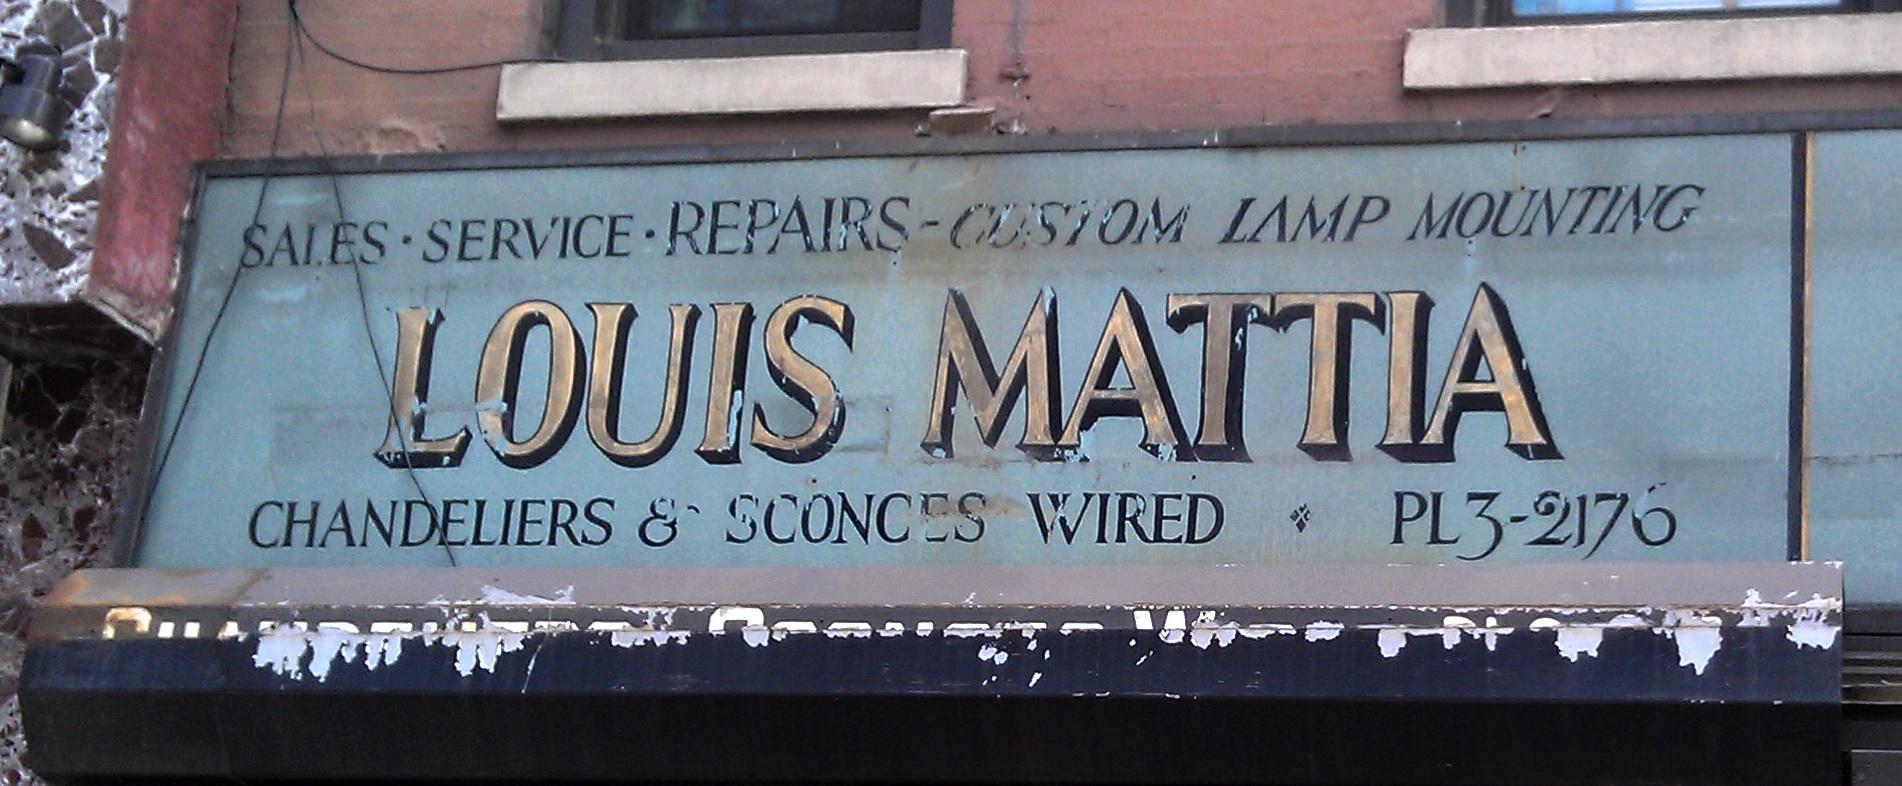 Vintage Laundromat Sign Vintage Store Signs  Ephemeral New York